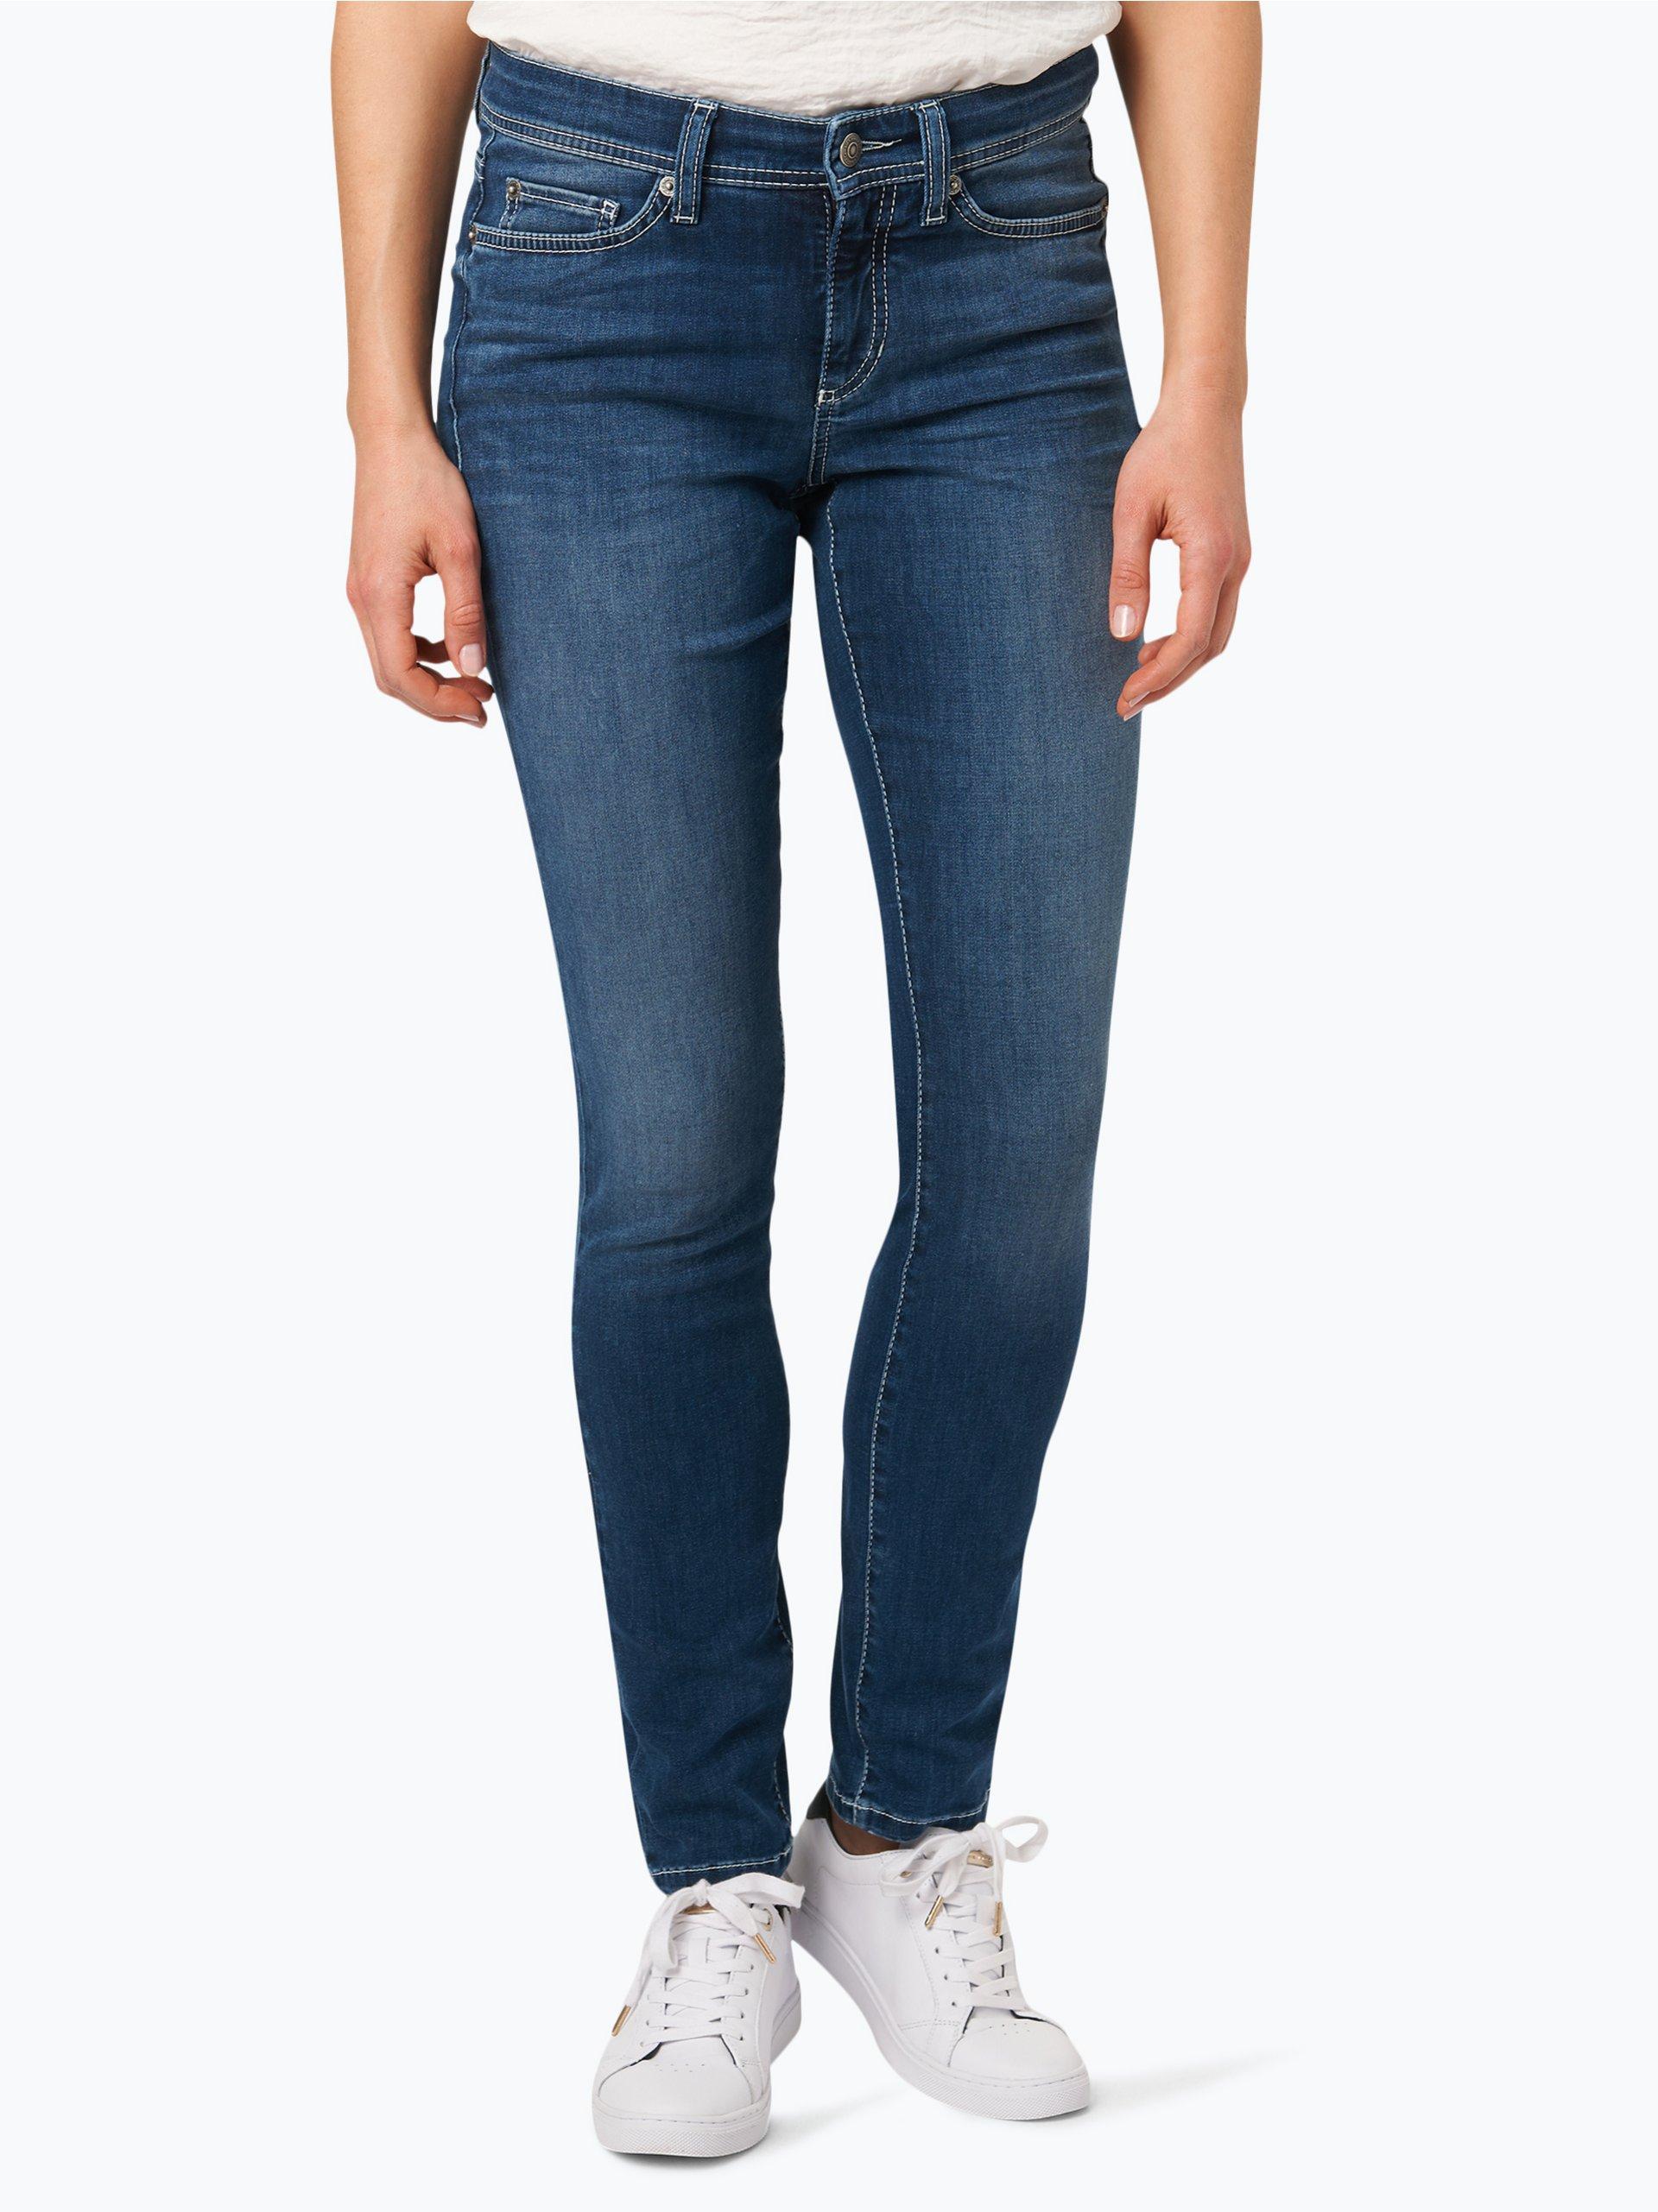 cambio damen jeans parla blue stone uni online kaufen vangraaf com. Black Bedroom Furniture Sets. Home Design Ideas